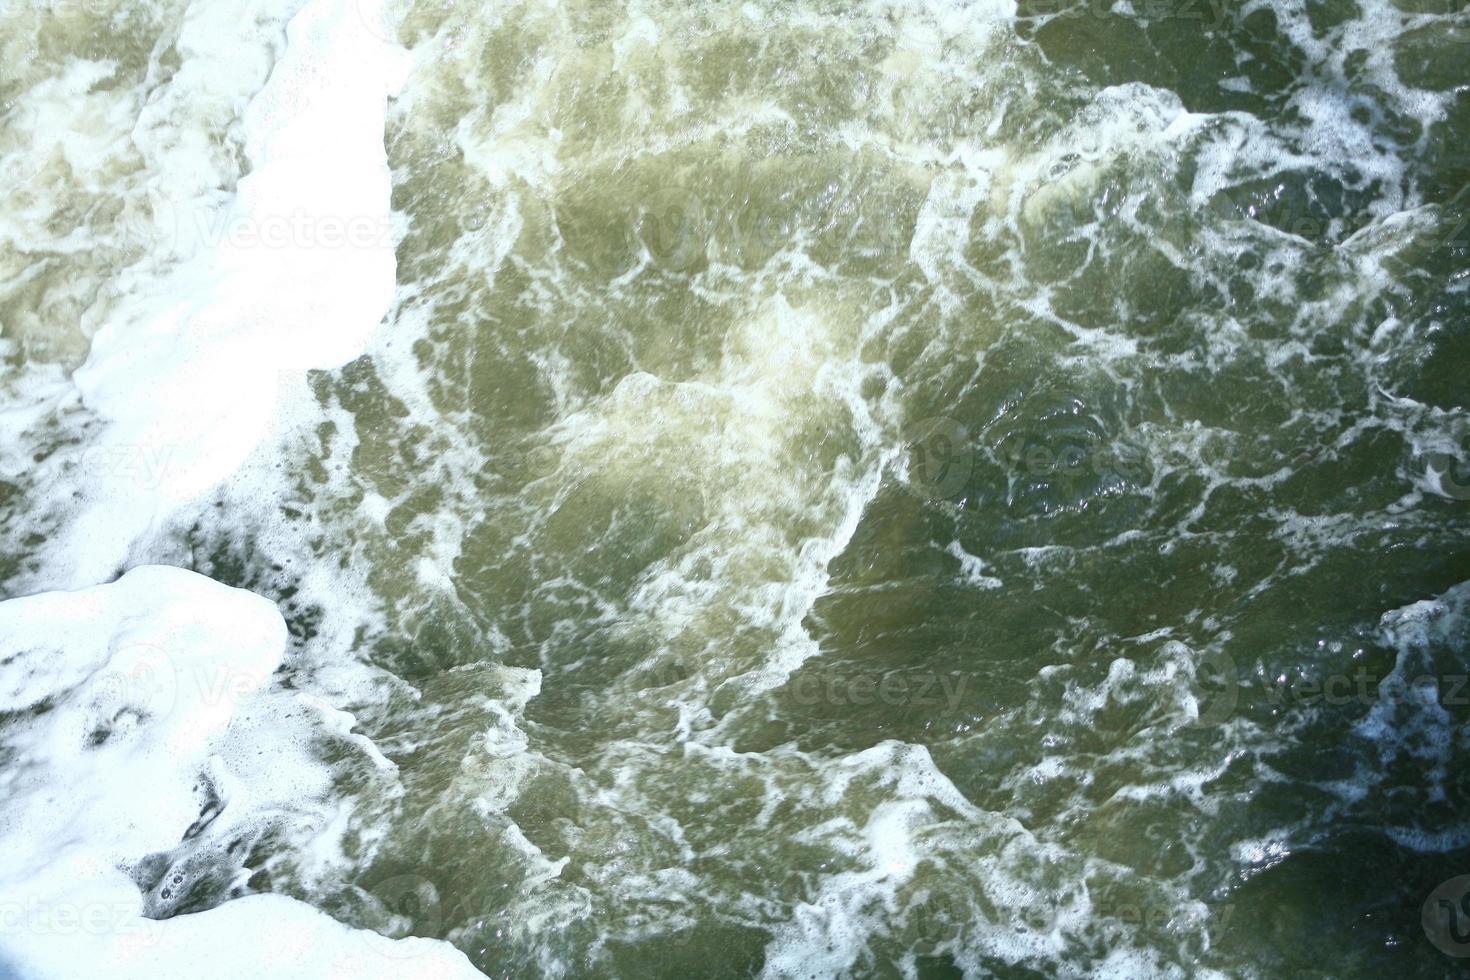 acqua fresca e pulita foto